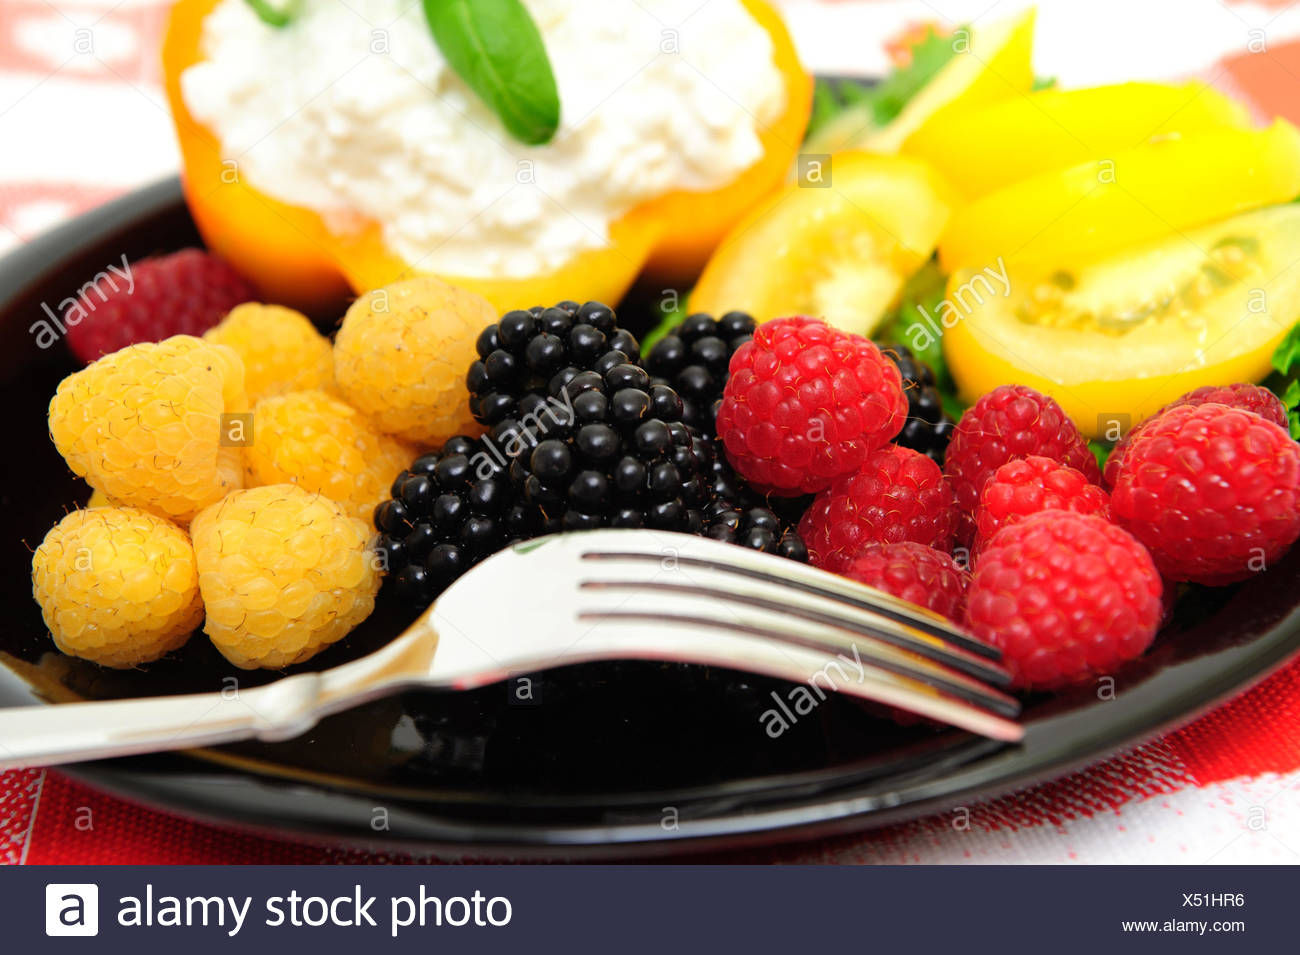 food aliment fruit raspberry berry dessert blackberry food aliment sweet - Stock Image